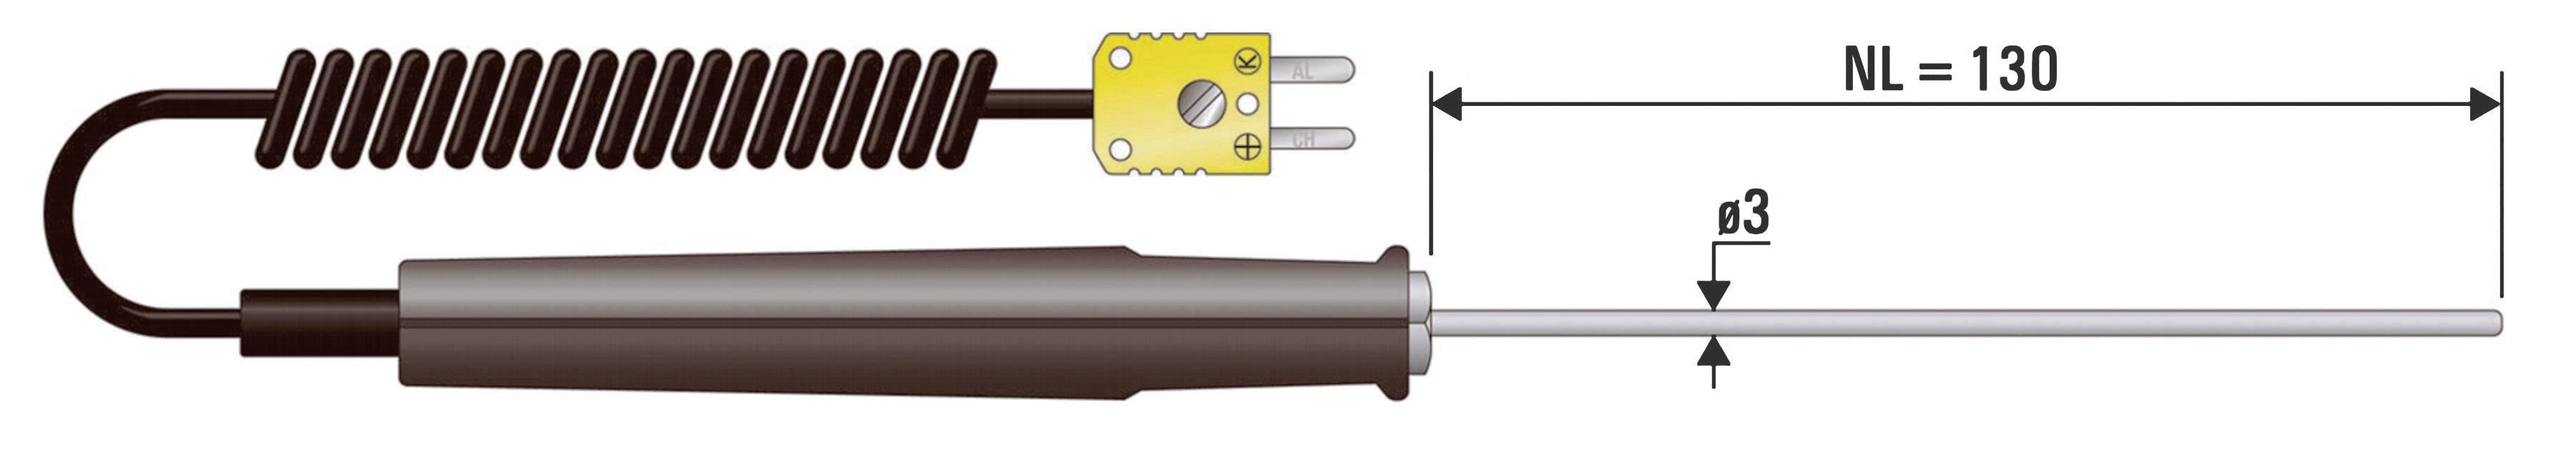 Vpichovacie čidlo B+B Thermo-Technik EHF 1xK NL 130 EHF 1xK NL 130, -50 do +400 °C, druh čidla=K